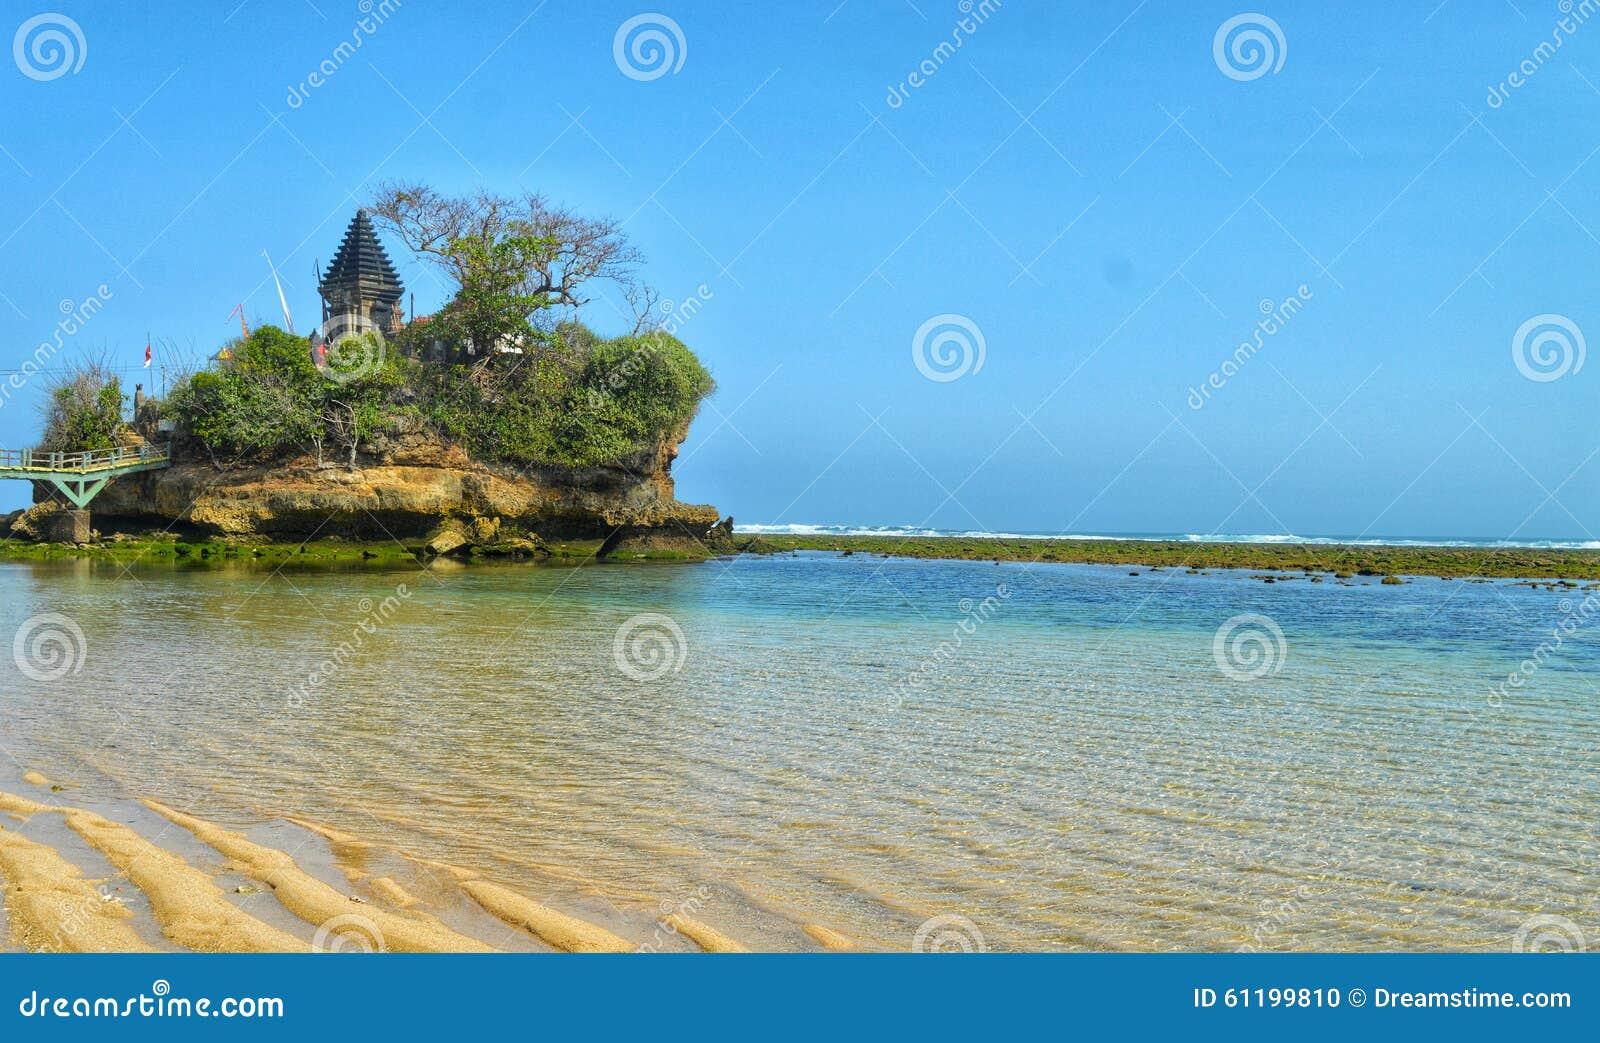 Download Balekambang beach temple stock photo. Image of east, indonesia - 61199810